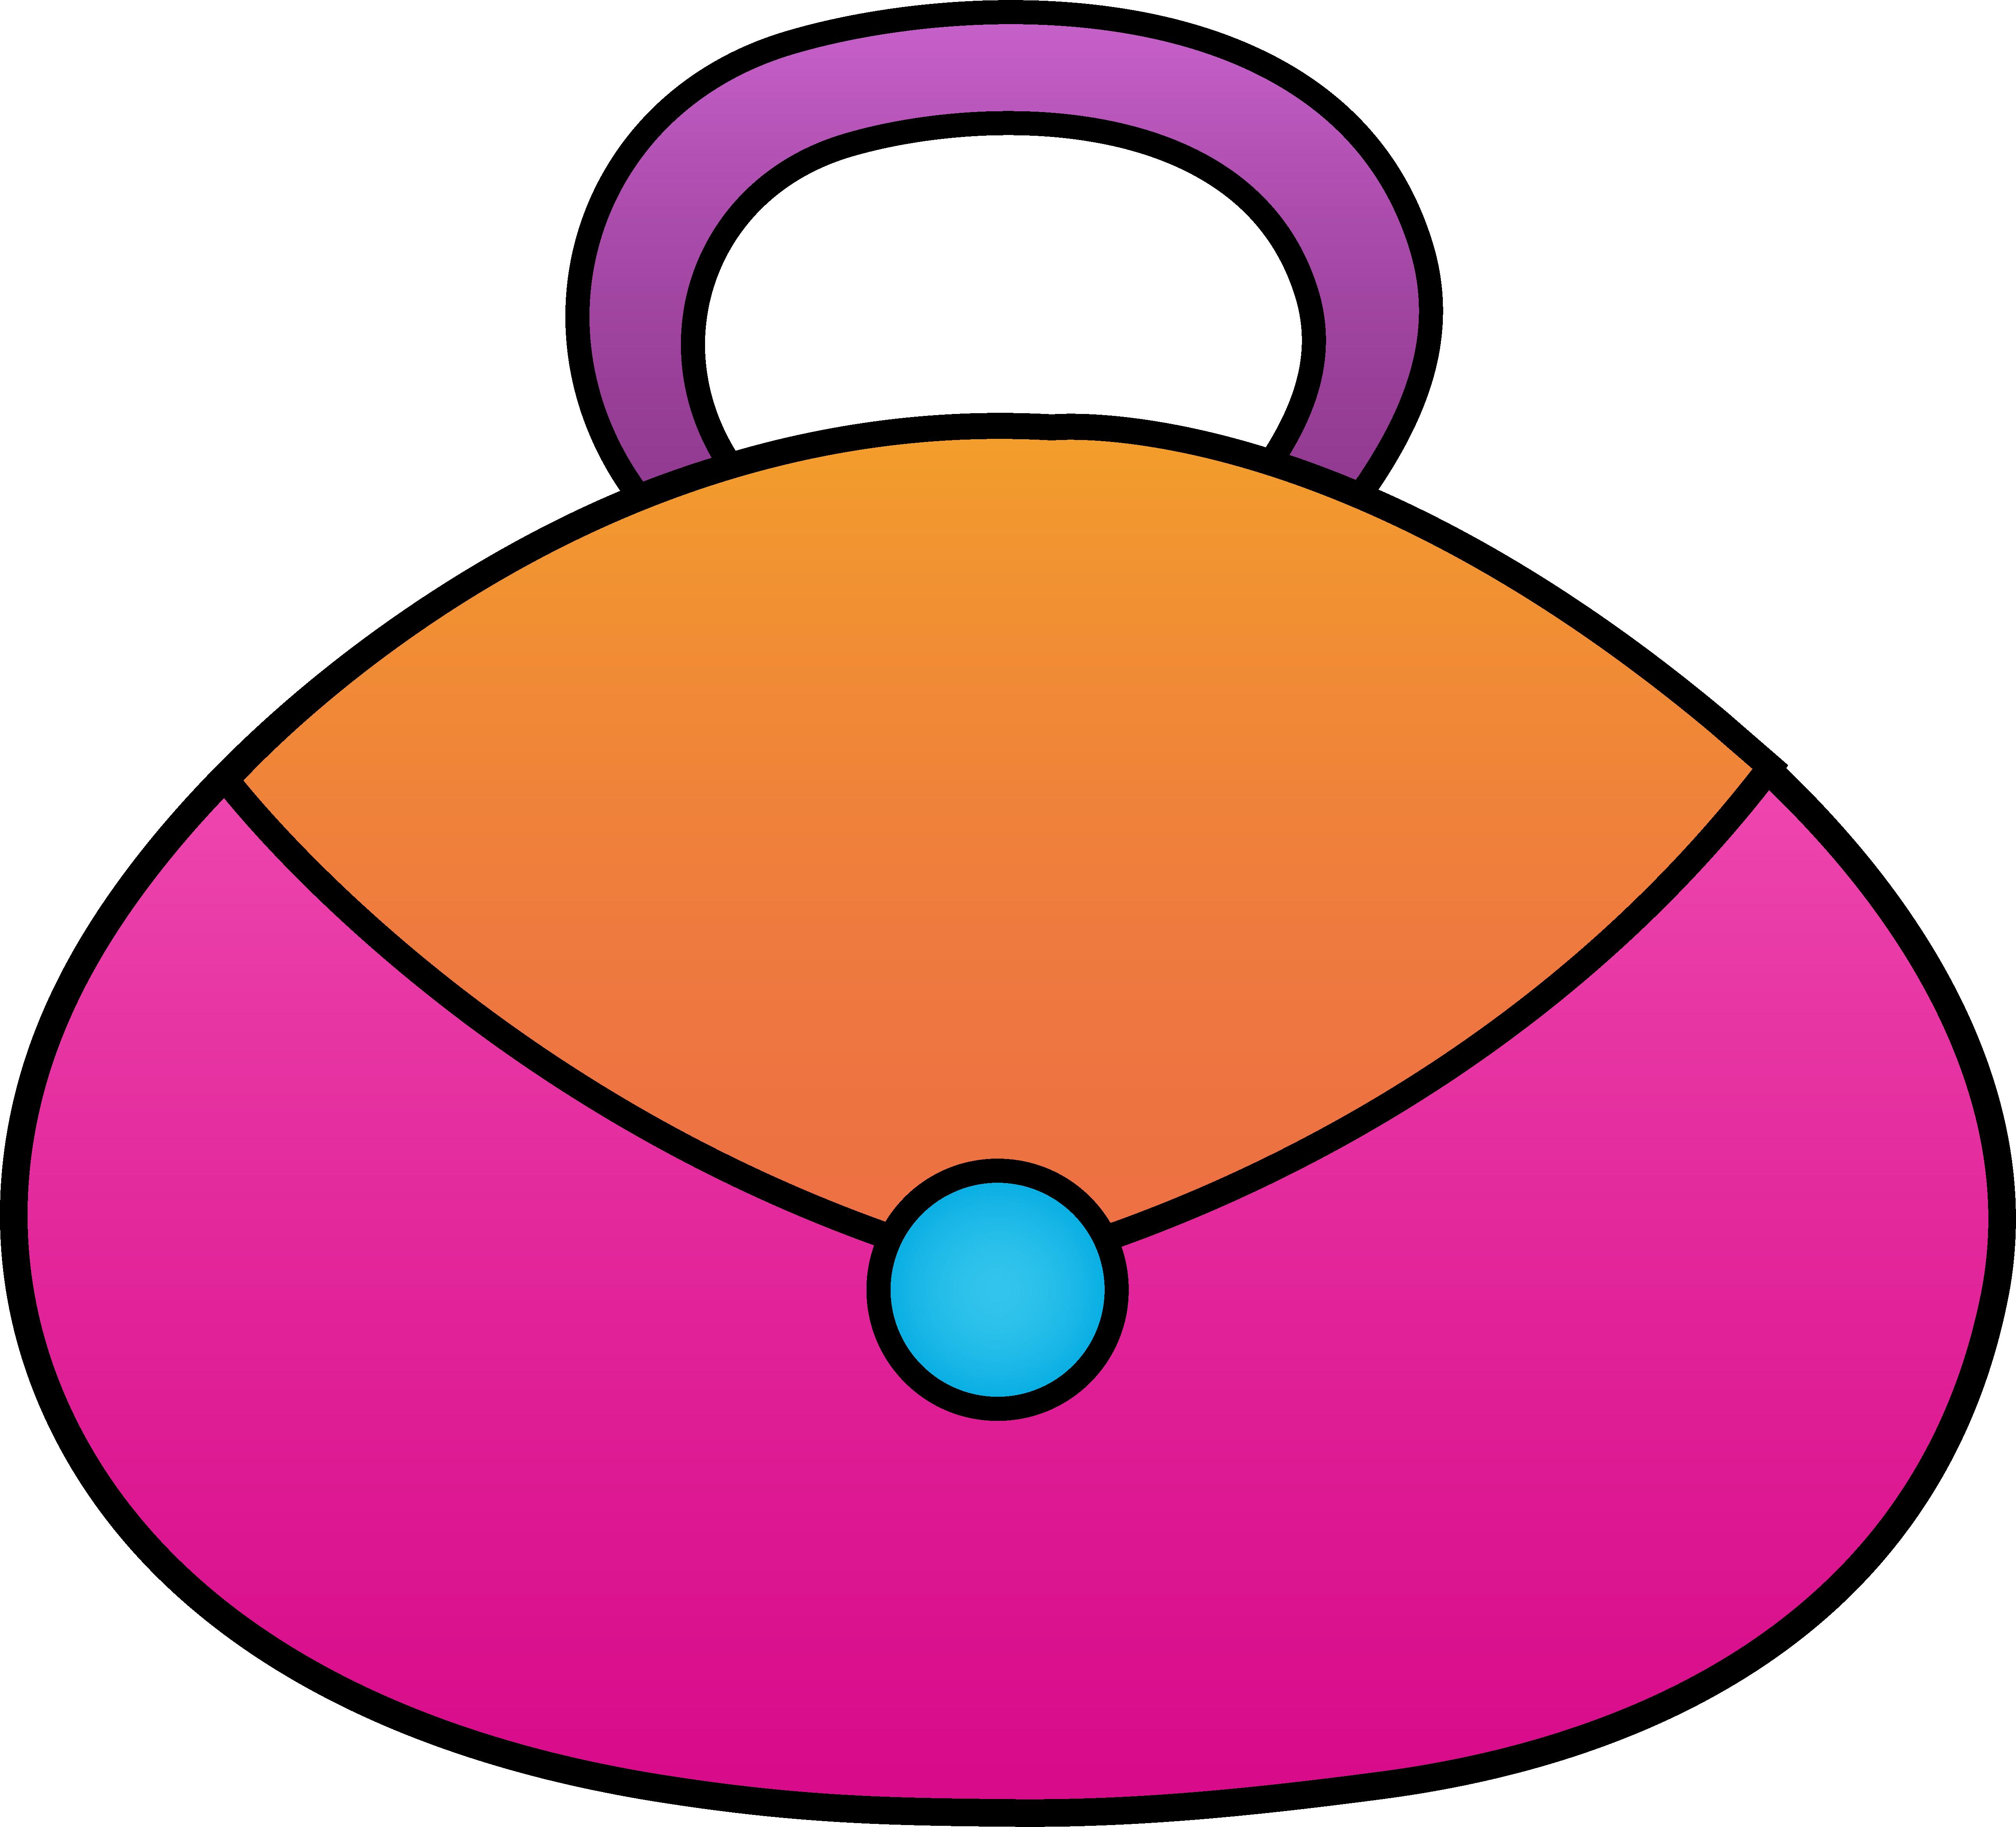 Little pink purse free. Cute clipart grandma